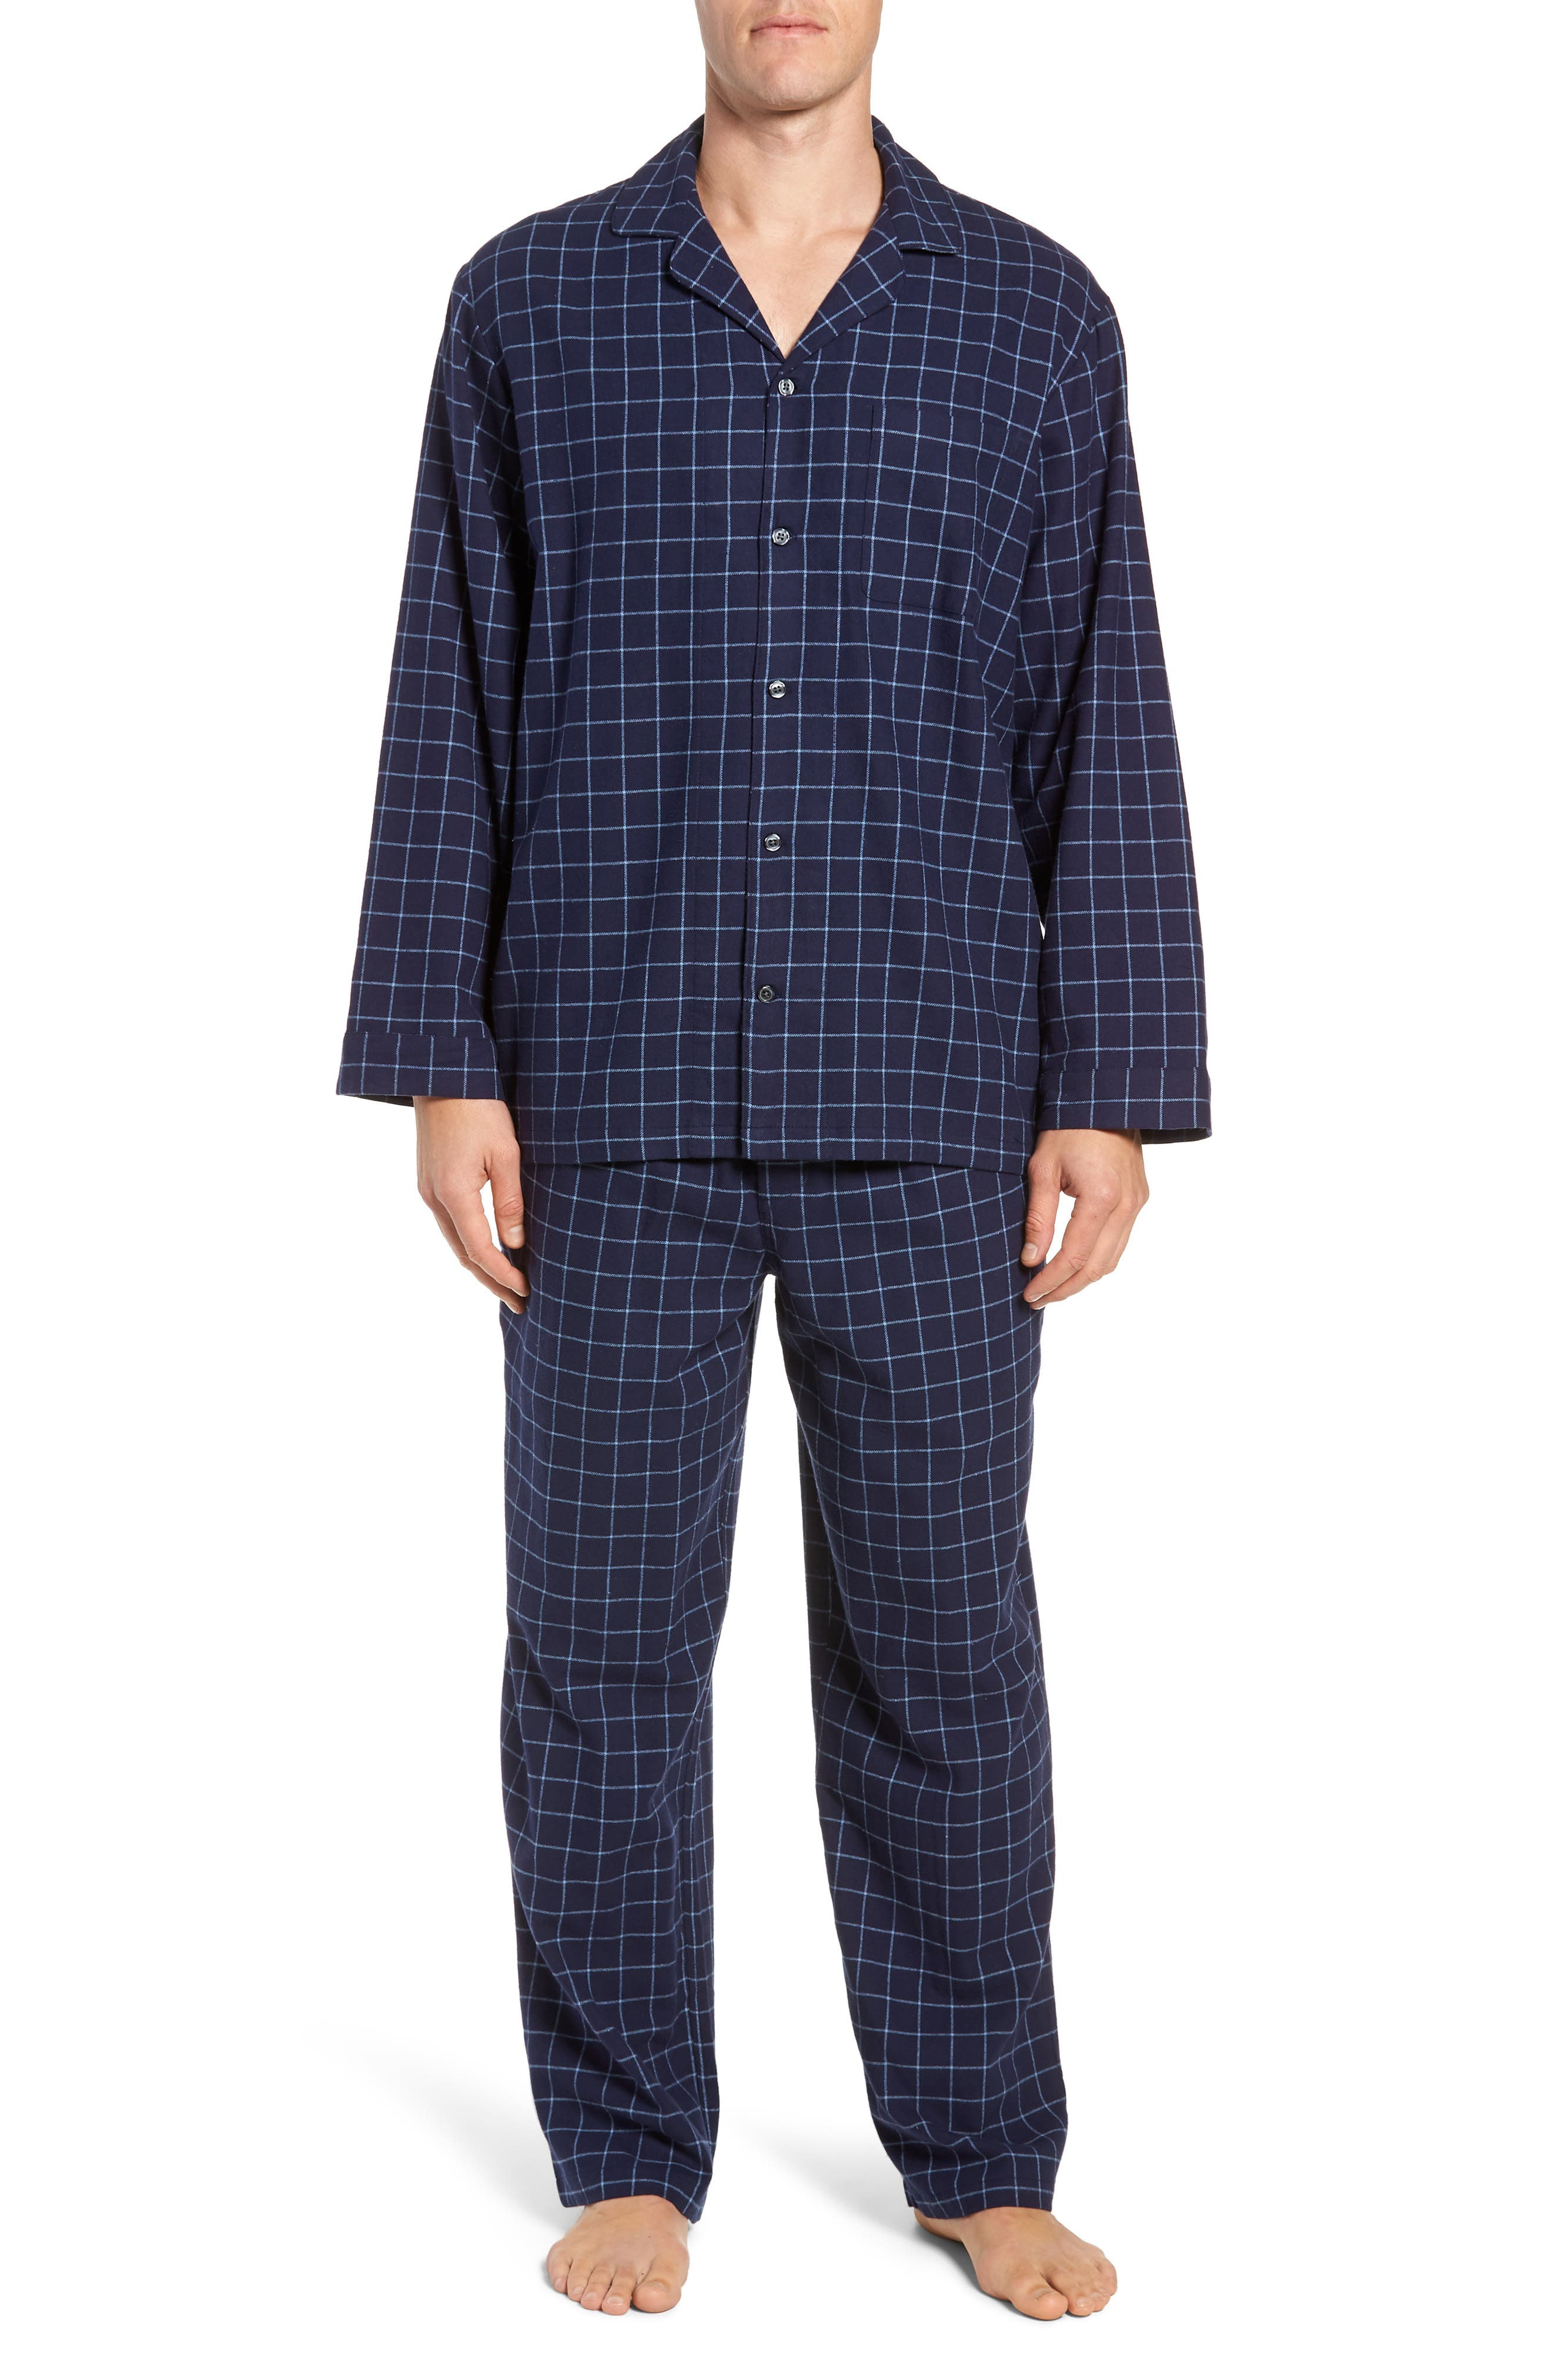 '824' Flannel Pajama Set,                             Main thumbnail 8, color,